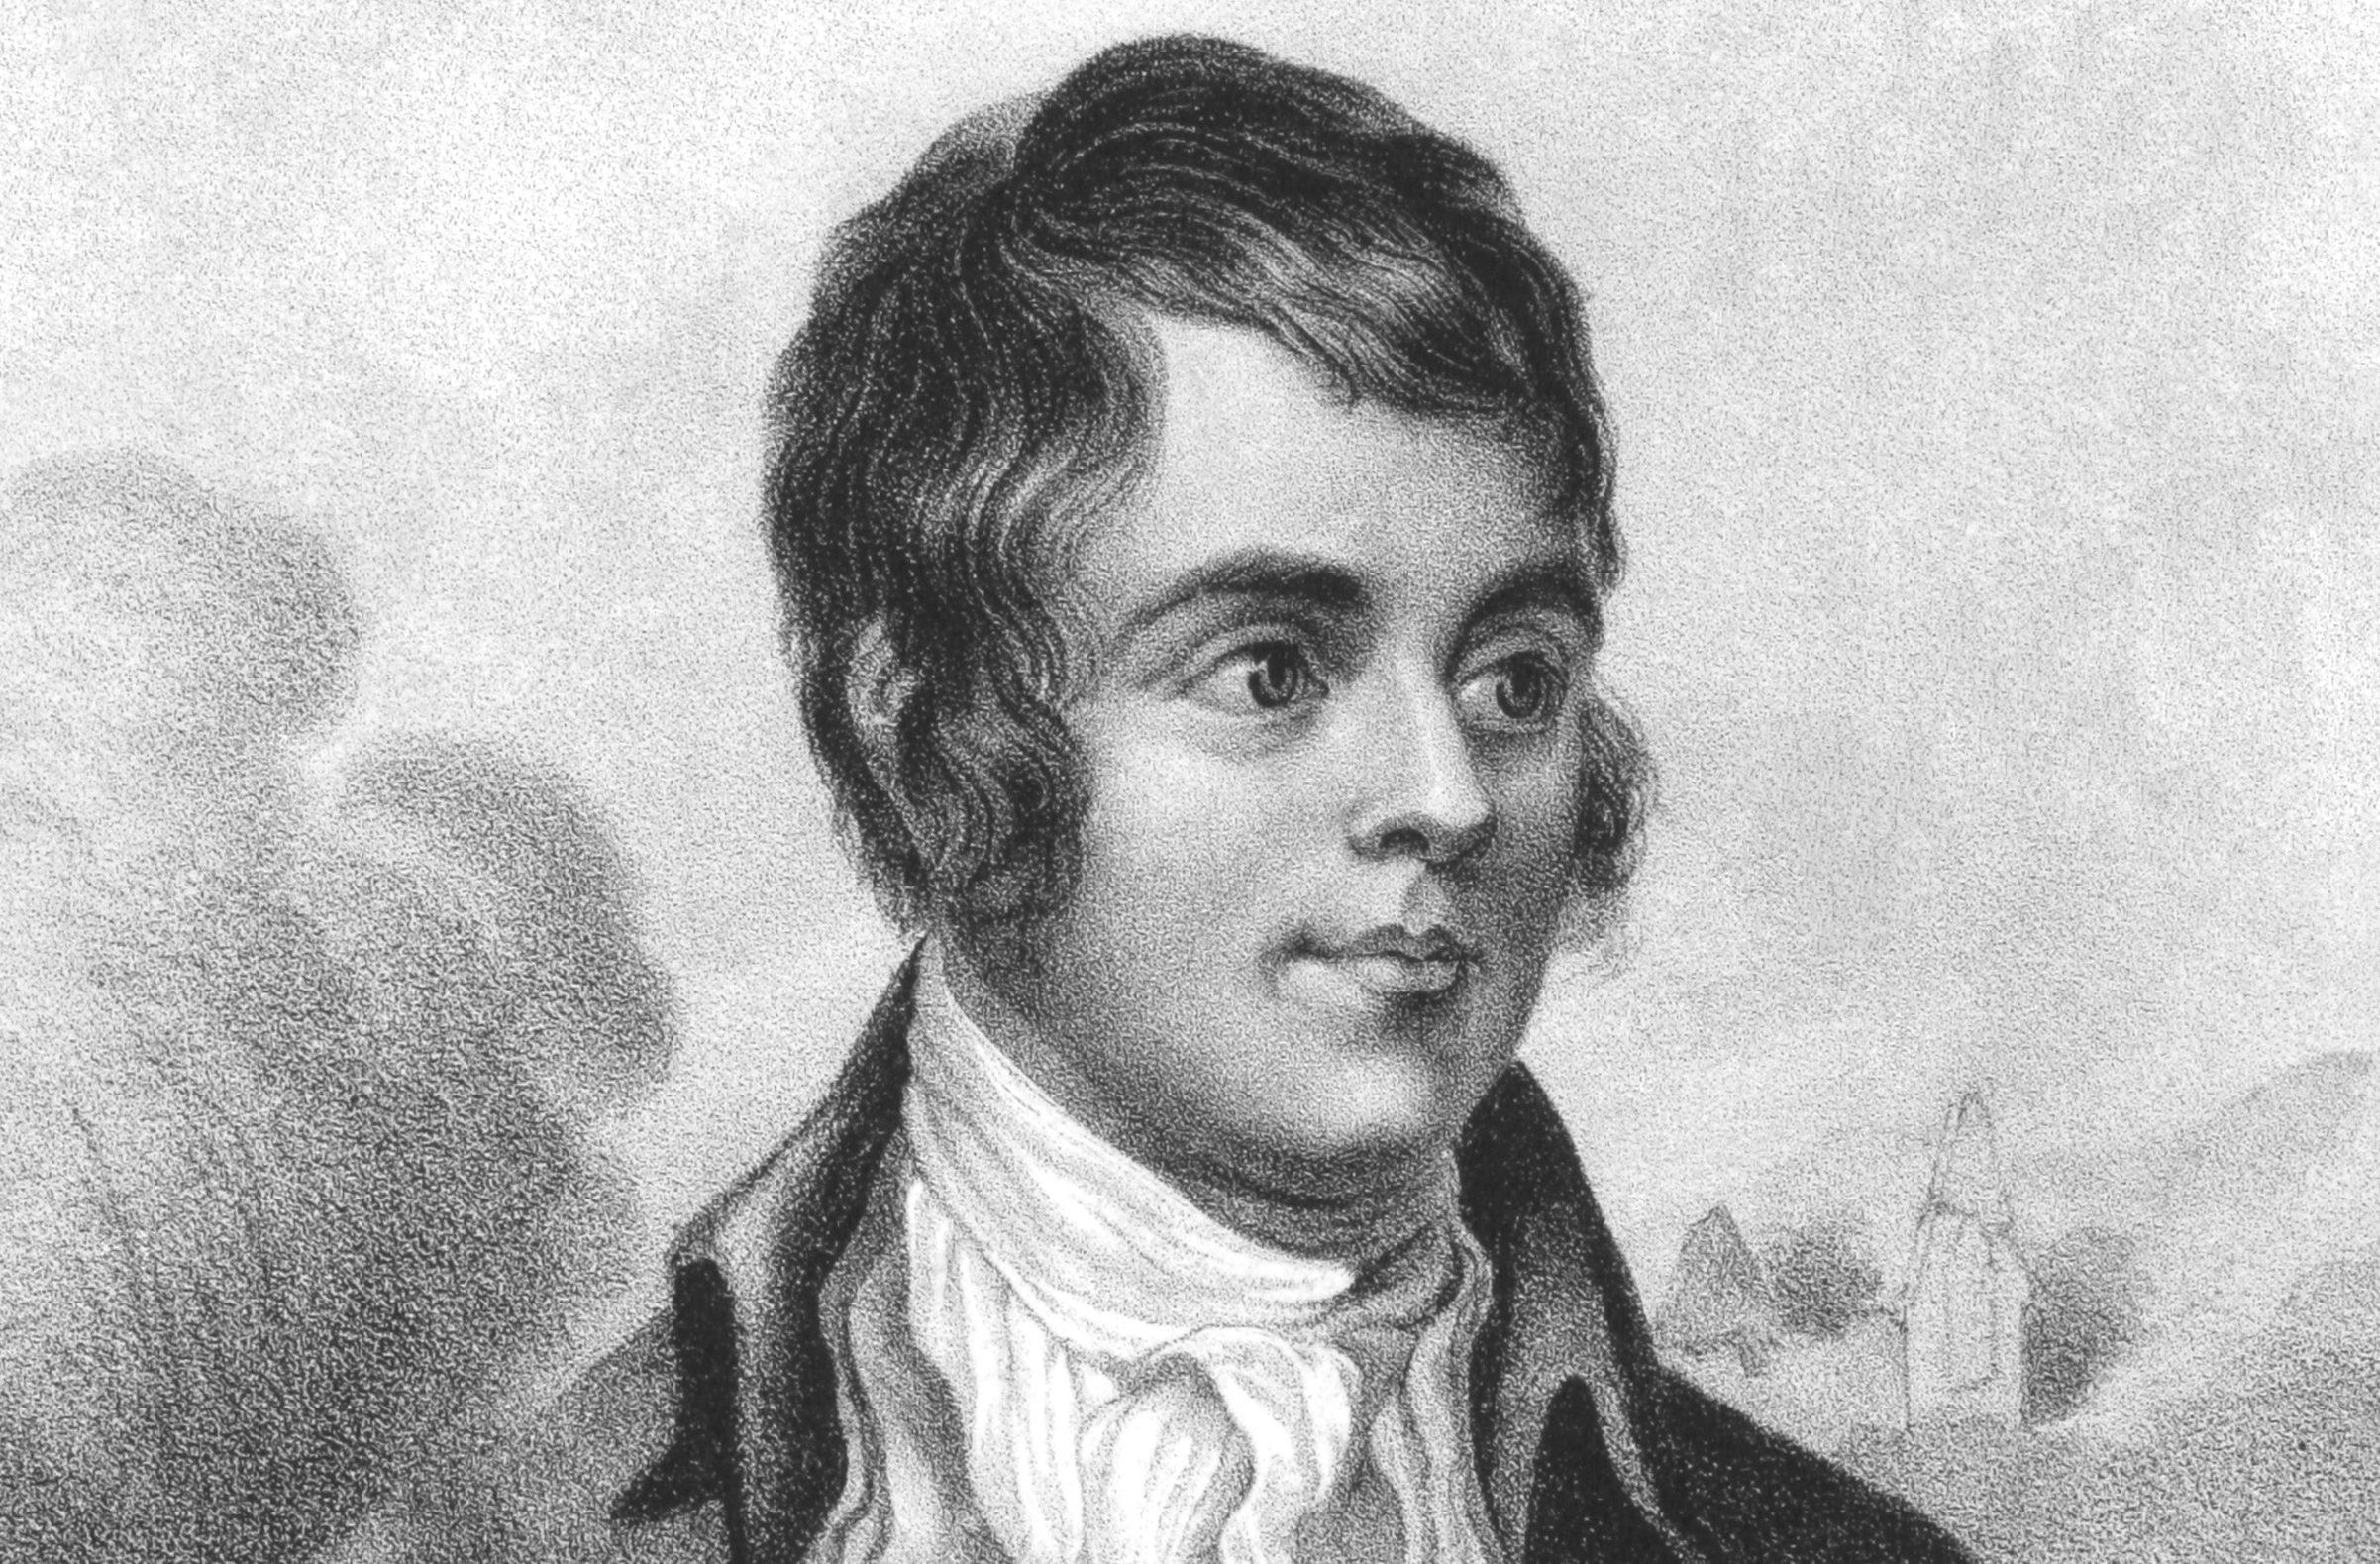 Robert Burns was born on 25 January 260 years ago. (iStock).